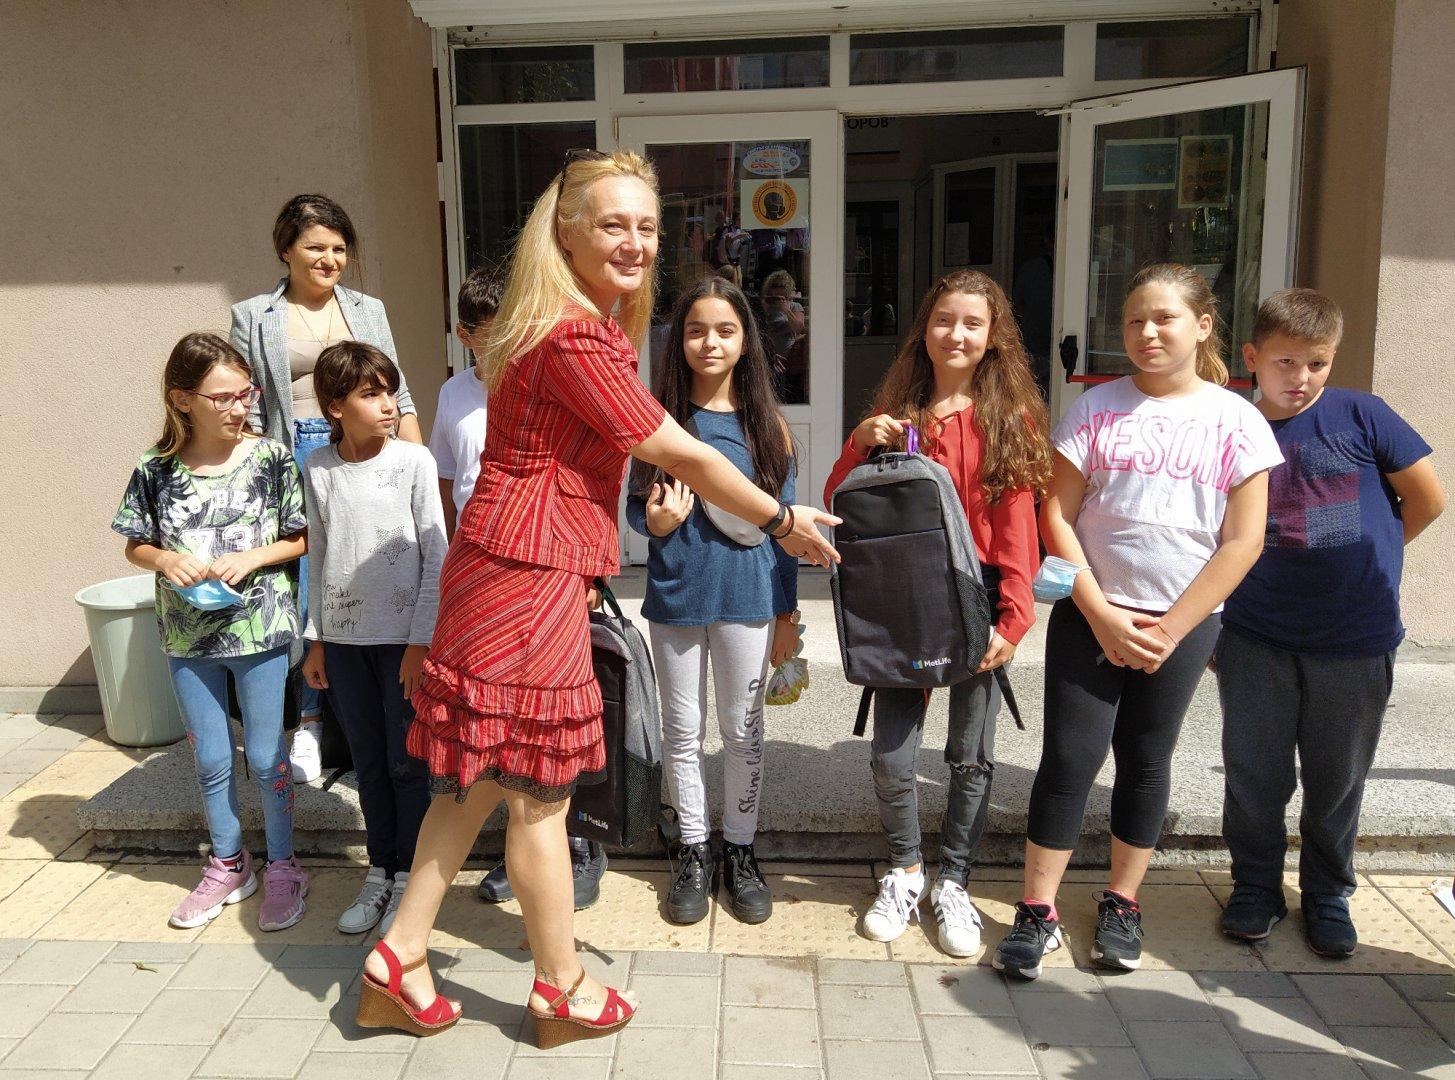 Красимира Катинова и колегите й от бургаскя клон зарадваха децата в ОУ Пейо Яворов с раници